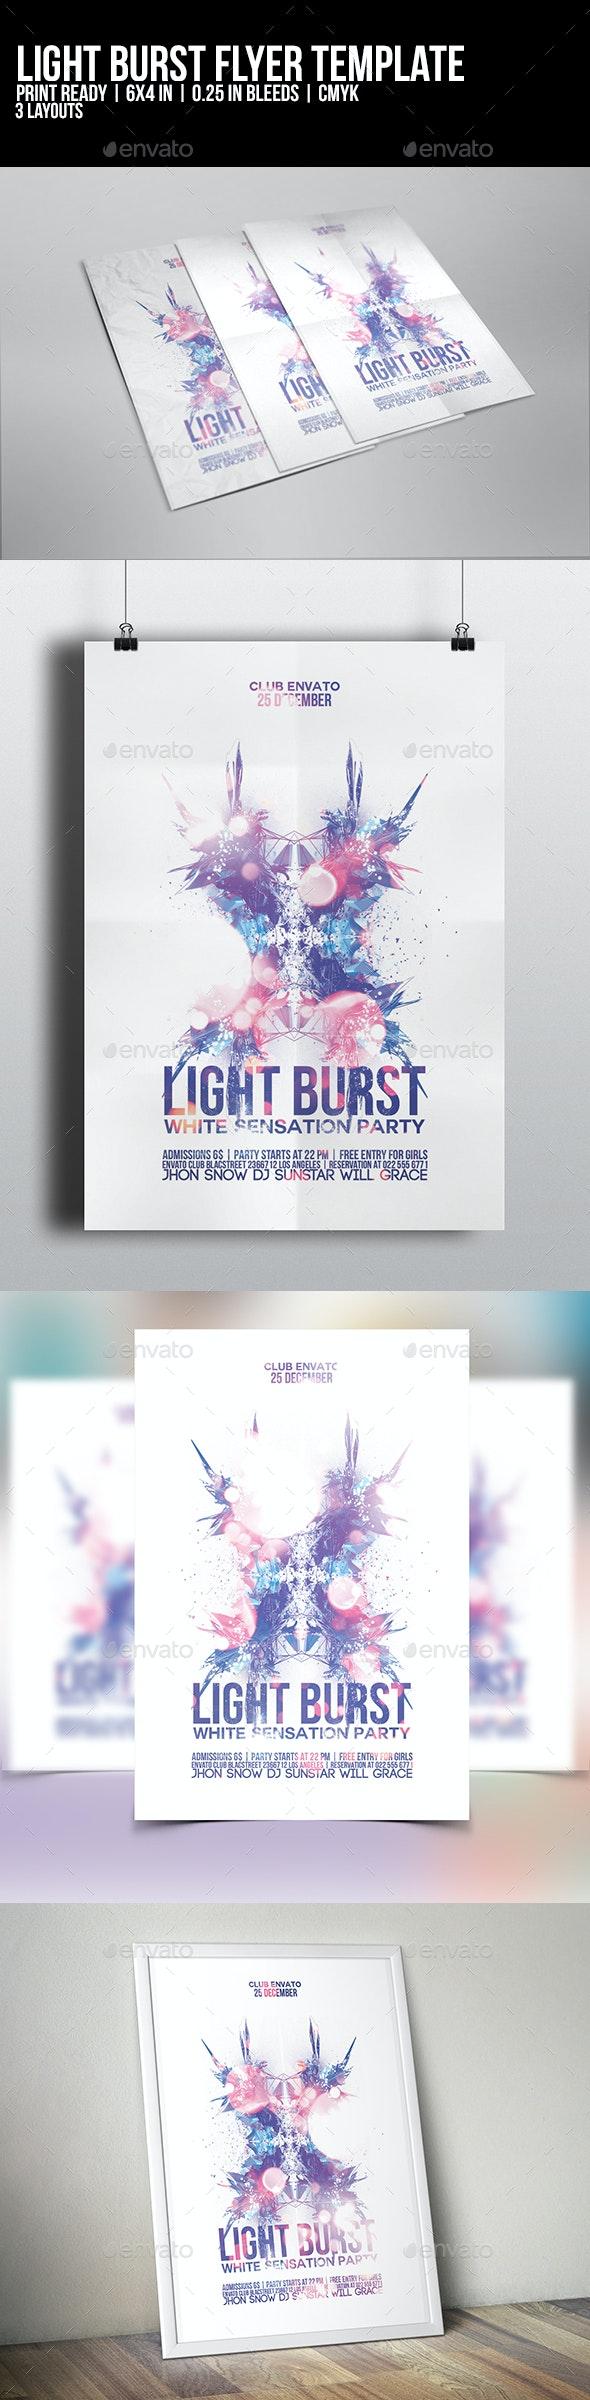 Light Burst Flyer Template - Clubs & Parties Events